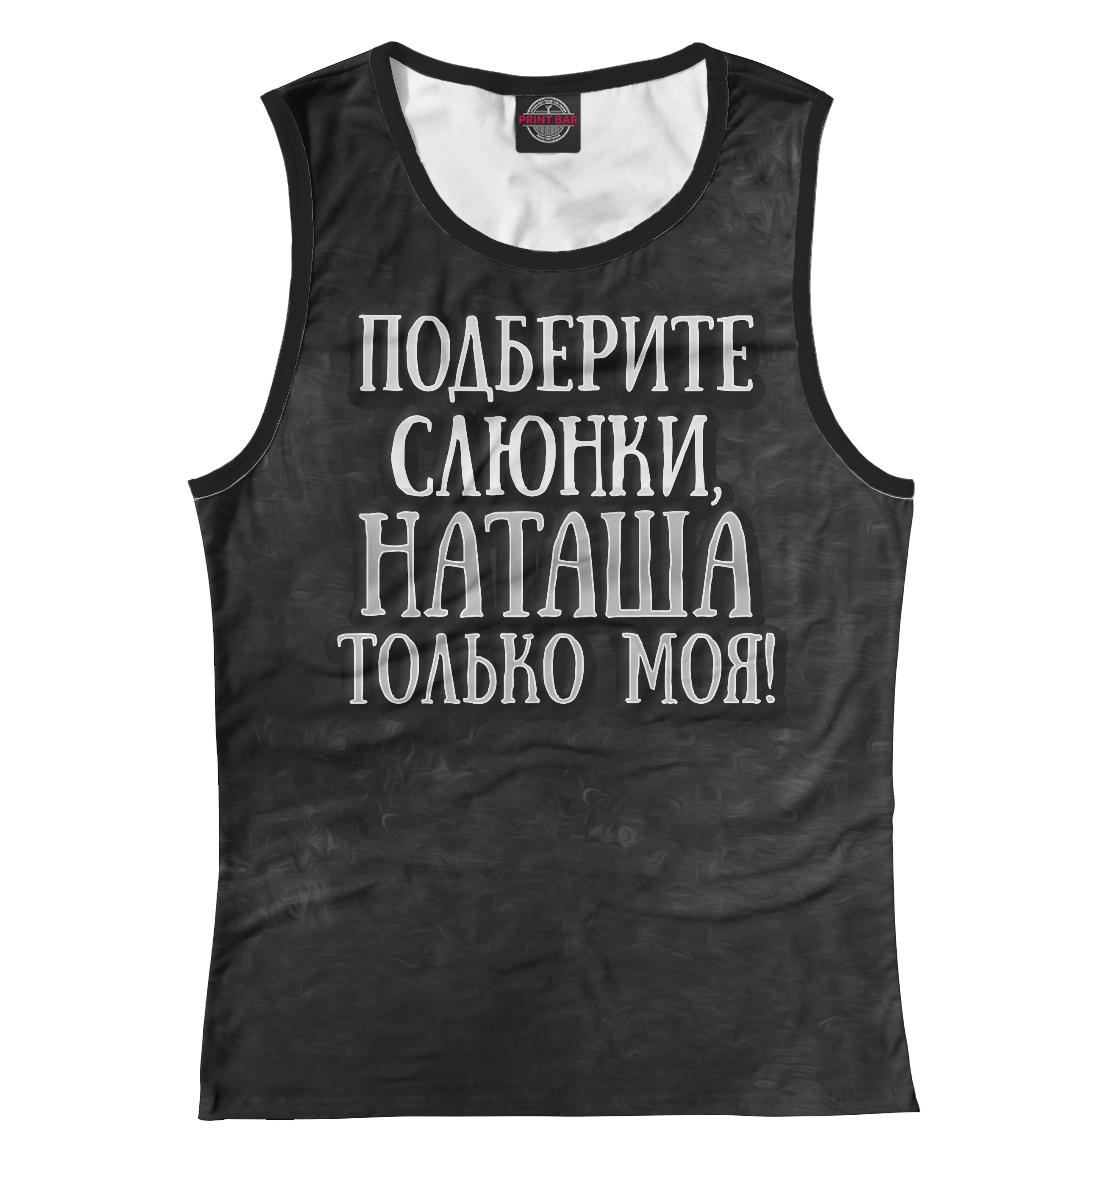 Купить Наташа моя!, Printbar, Майки, IMR-387839-may-1